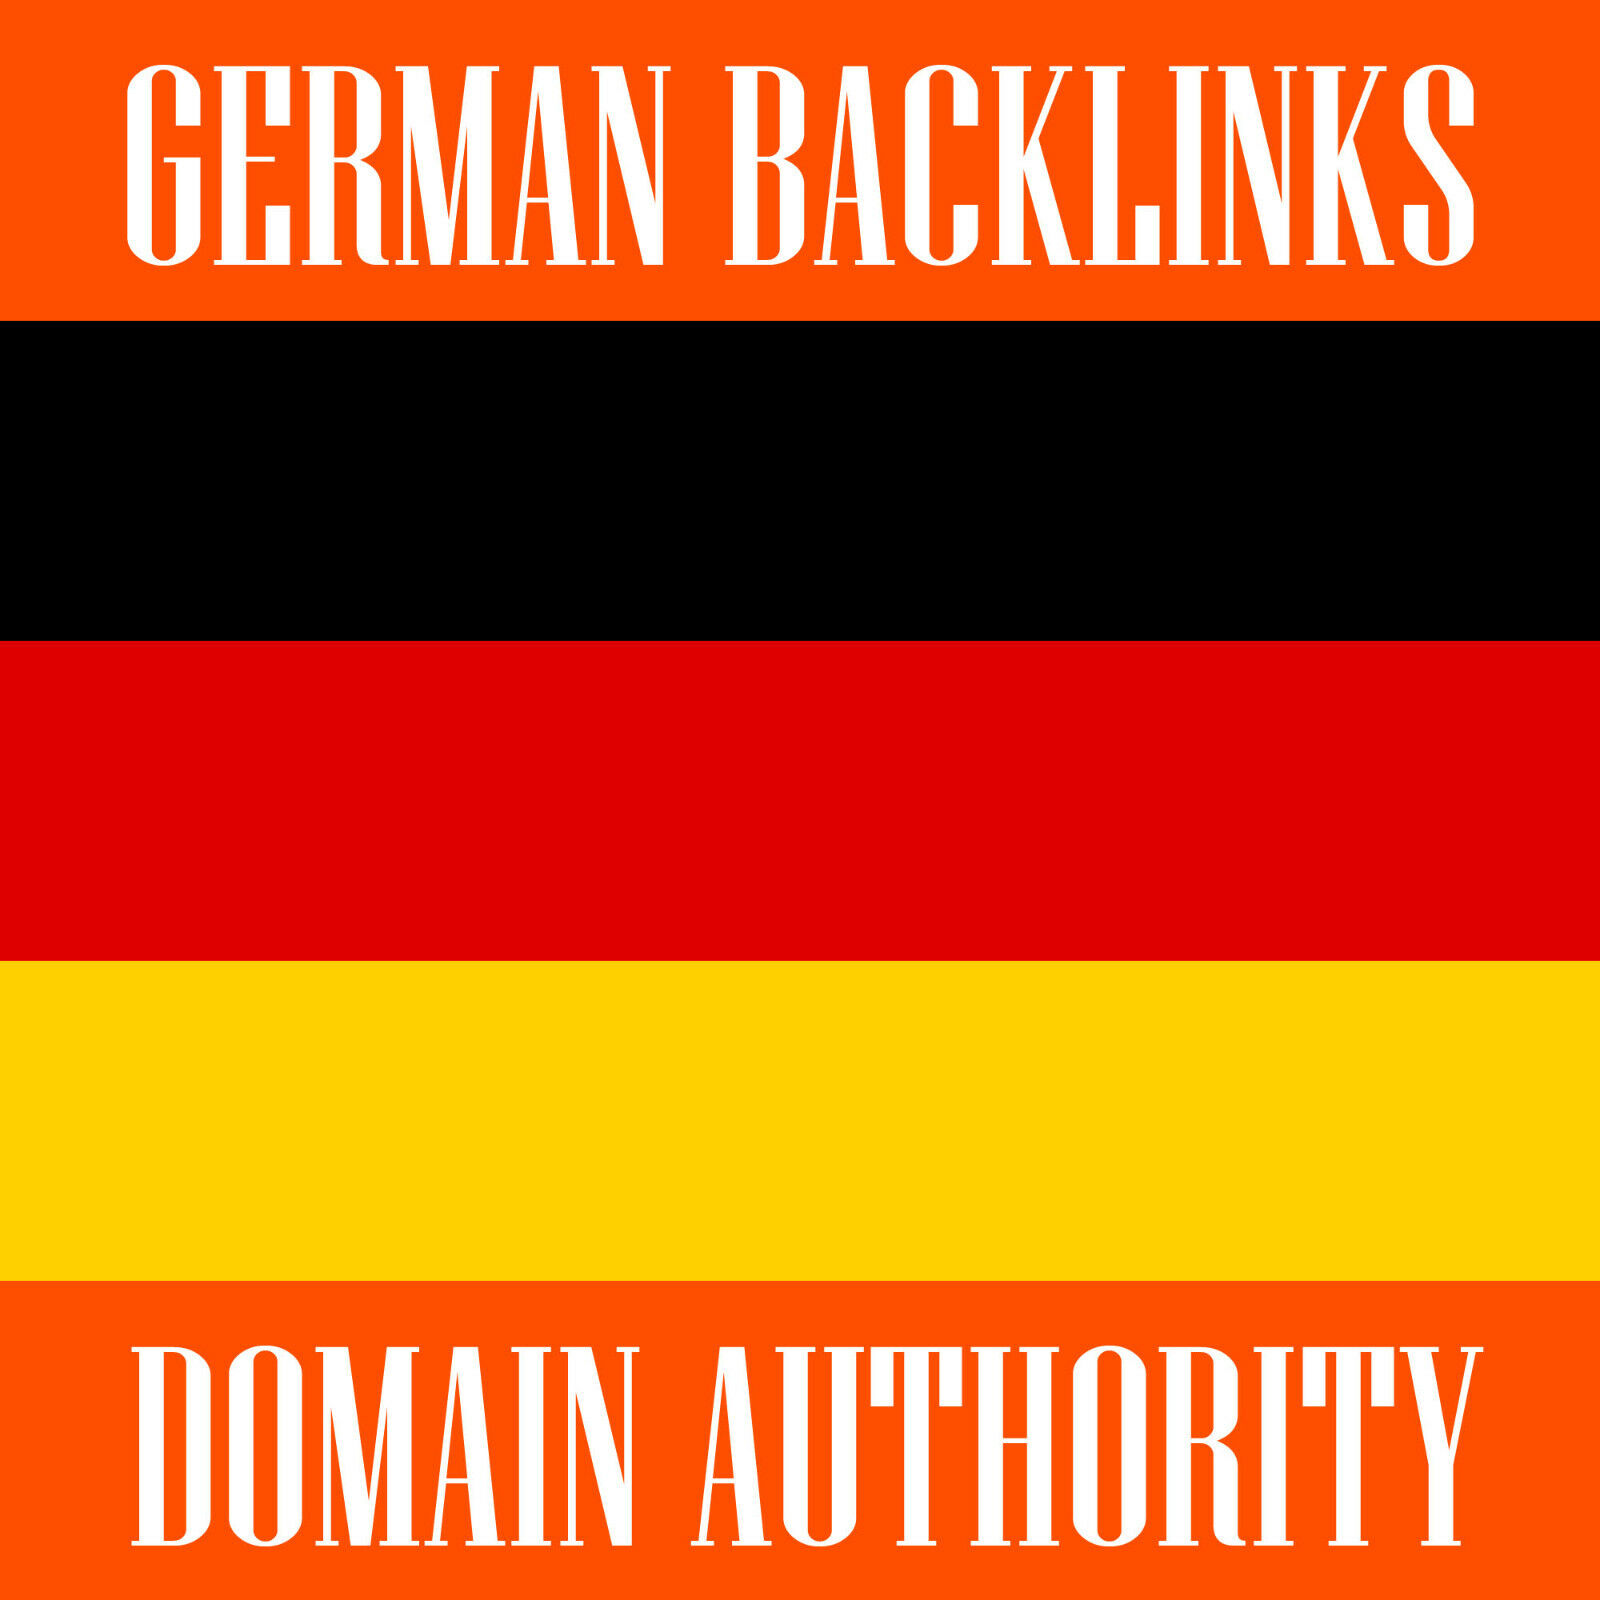 100x Domain Authority German Backlinks German Redirect Backlinks Da Backlinks